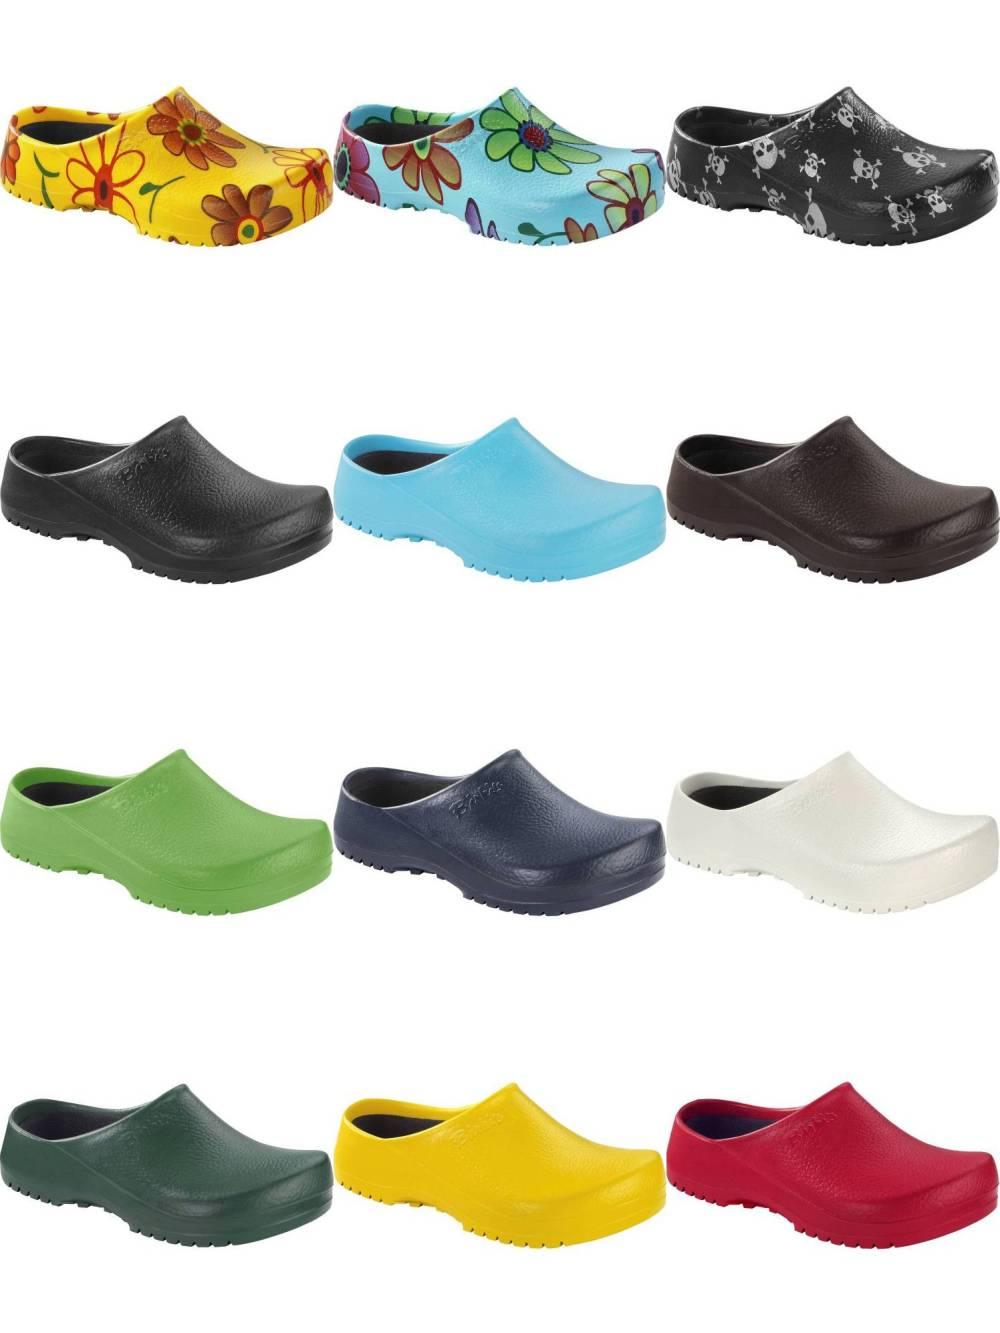 BIRKENSTOCK Super-Birki (Gummi)-Clog Super Birki Unisex Schuhe